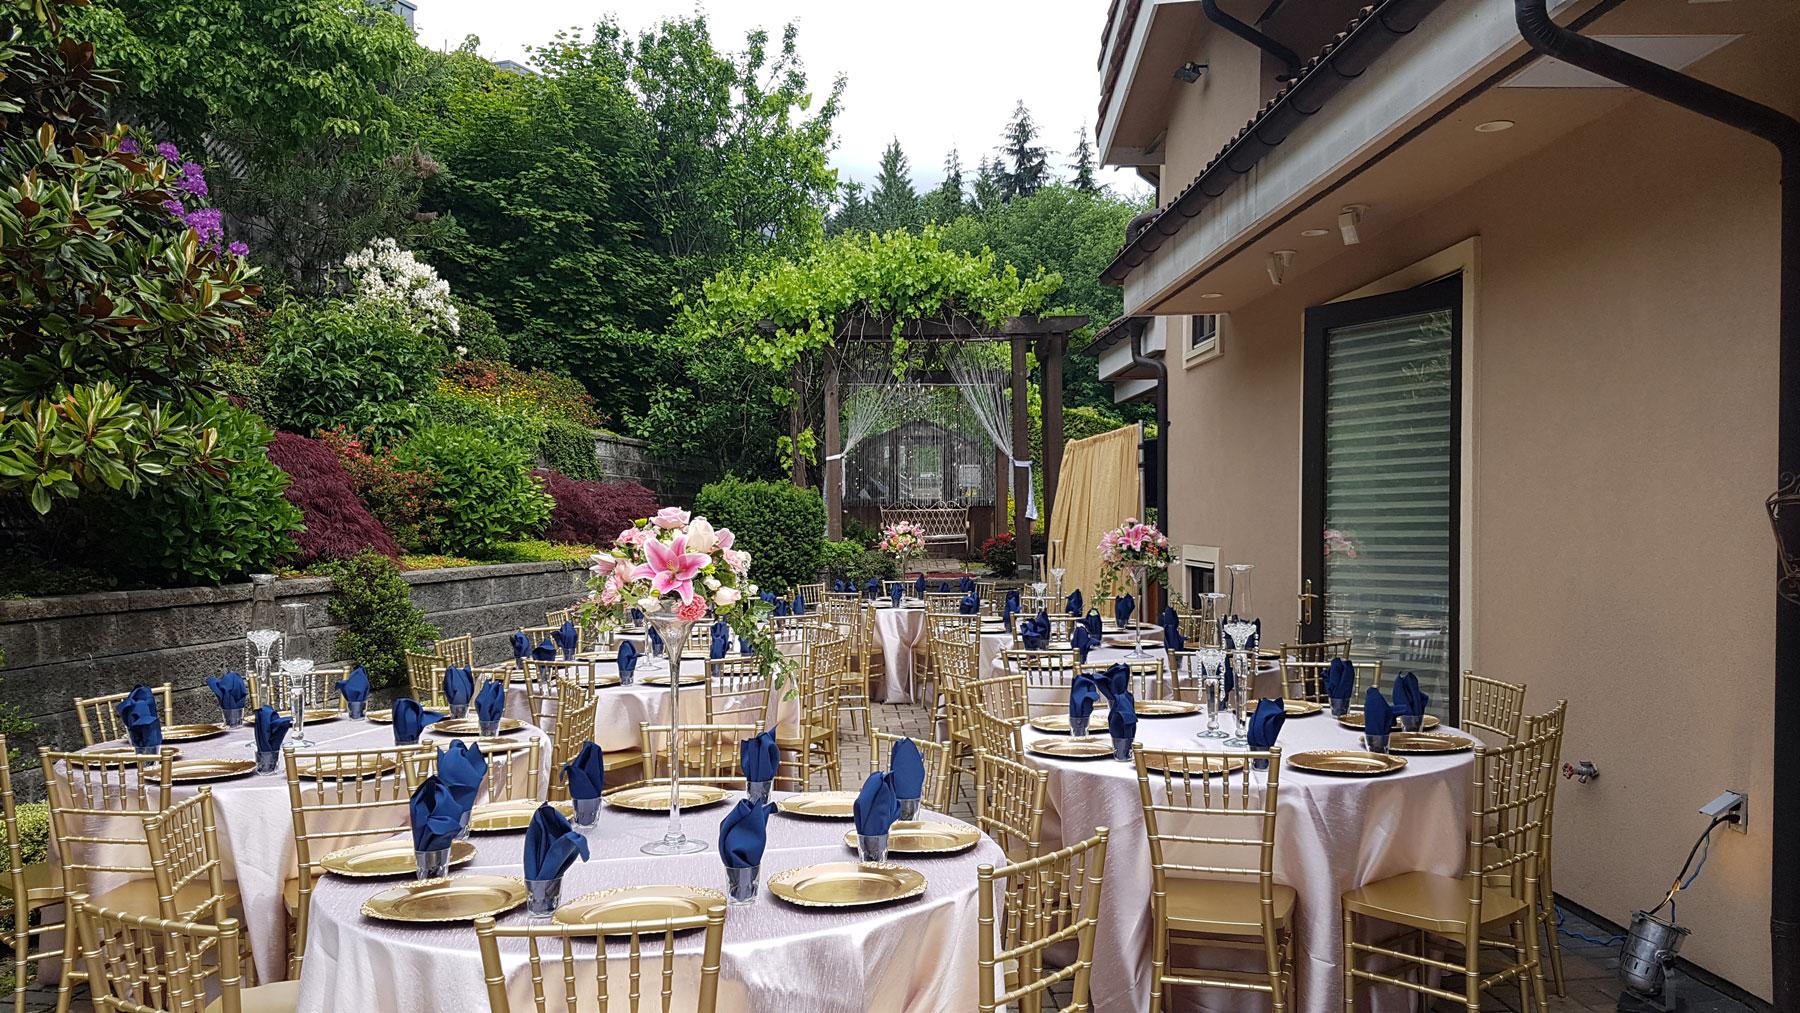 Backyard - house party - home event - chiavari chair - chivari - rustic wedding - centerpiece